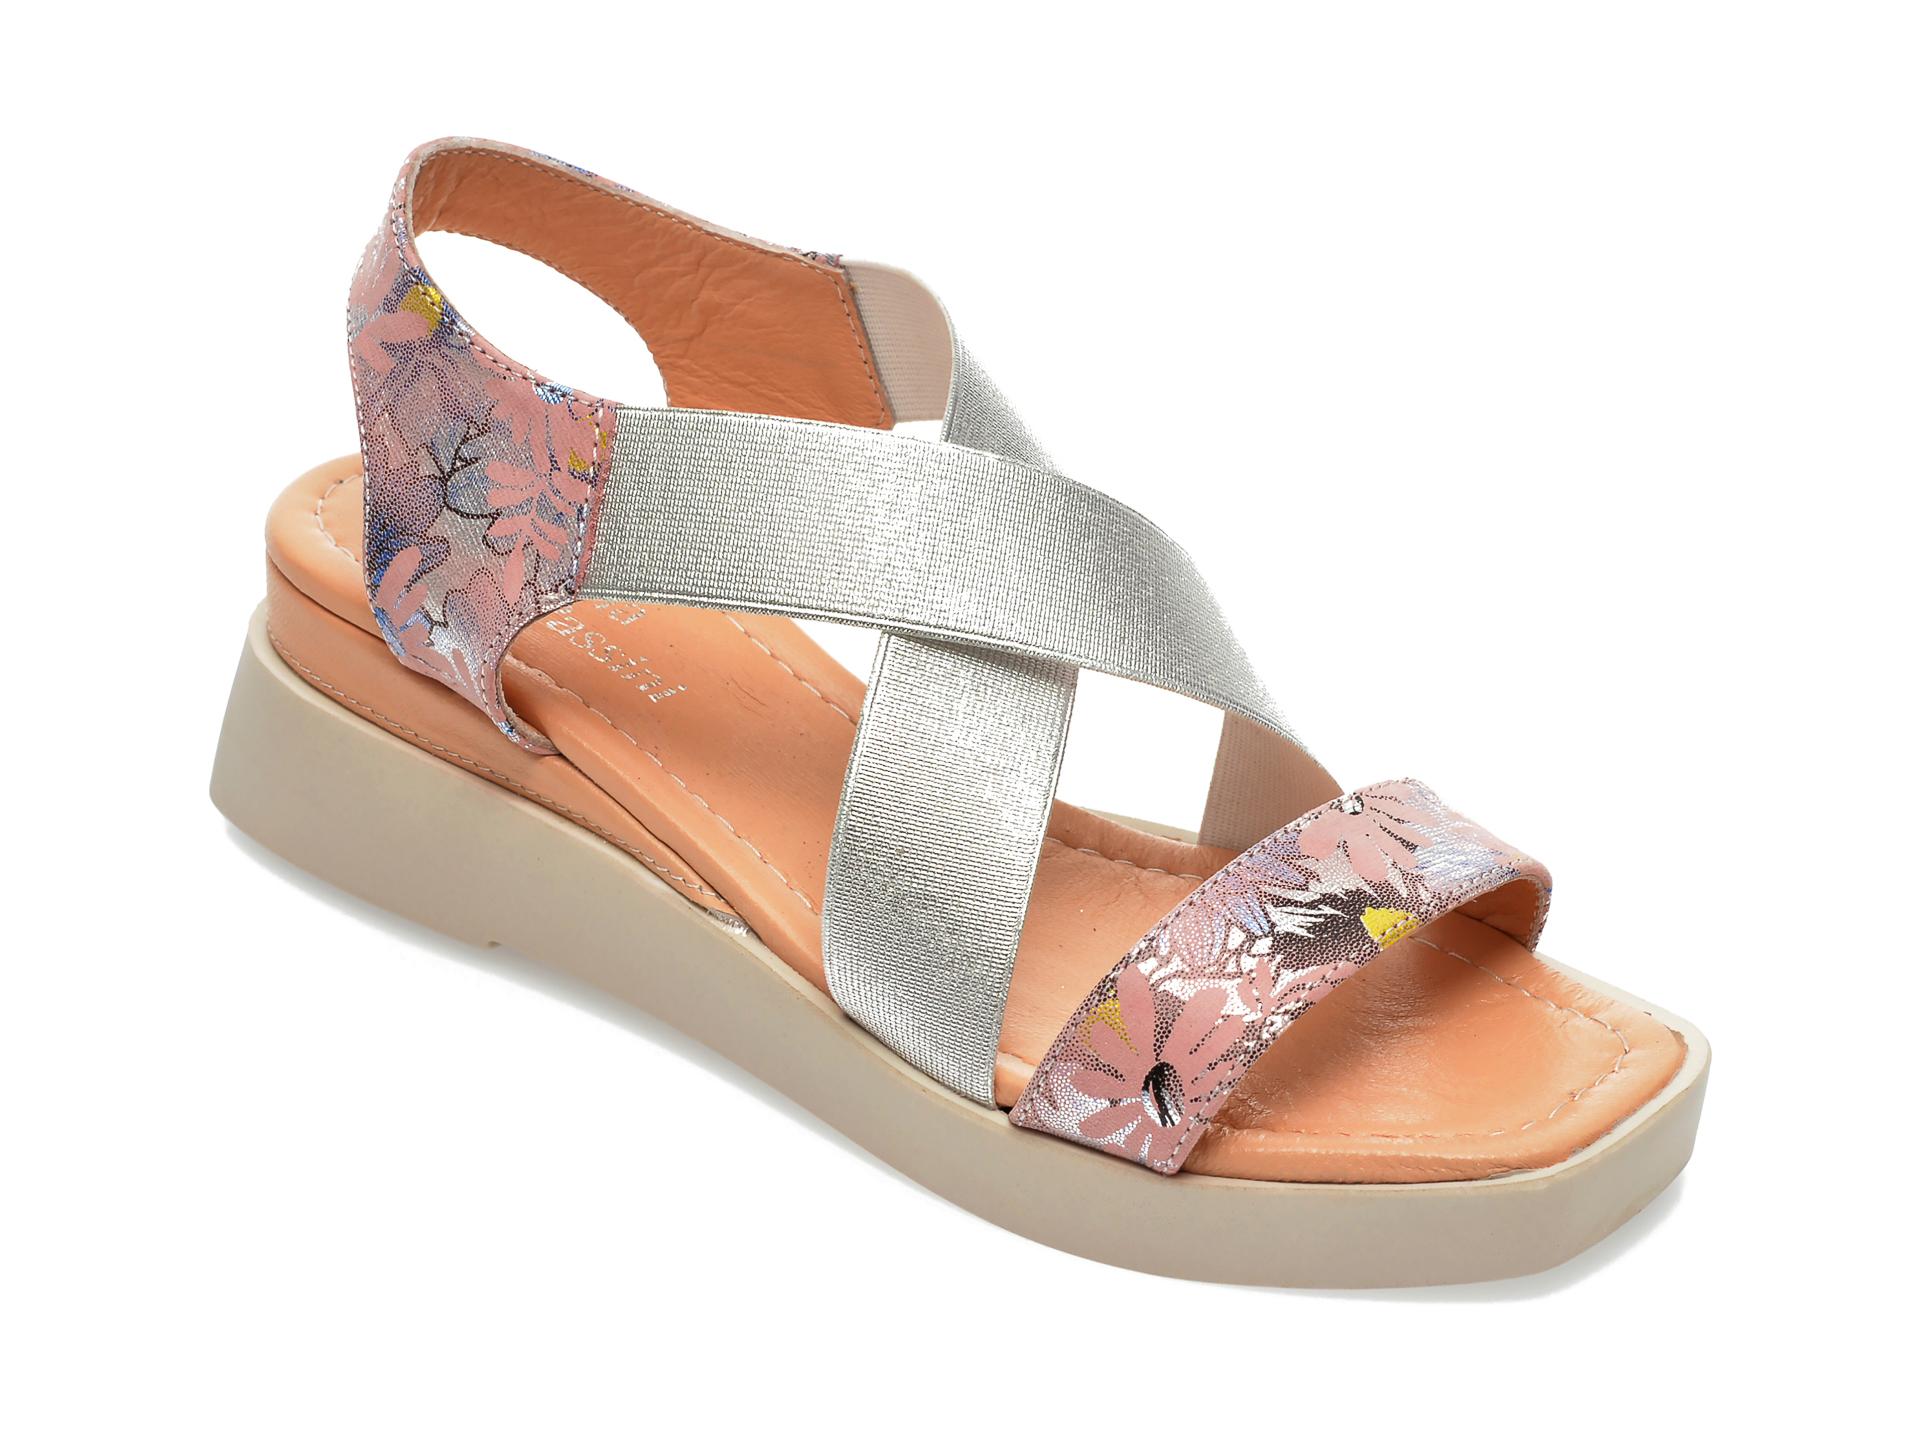 Sandale FLAVIA PASSINI roz, 40013, din material textil si piele naturala imagine otter.ro